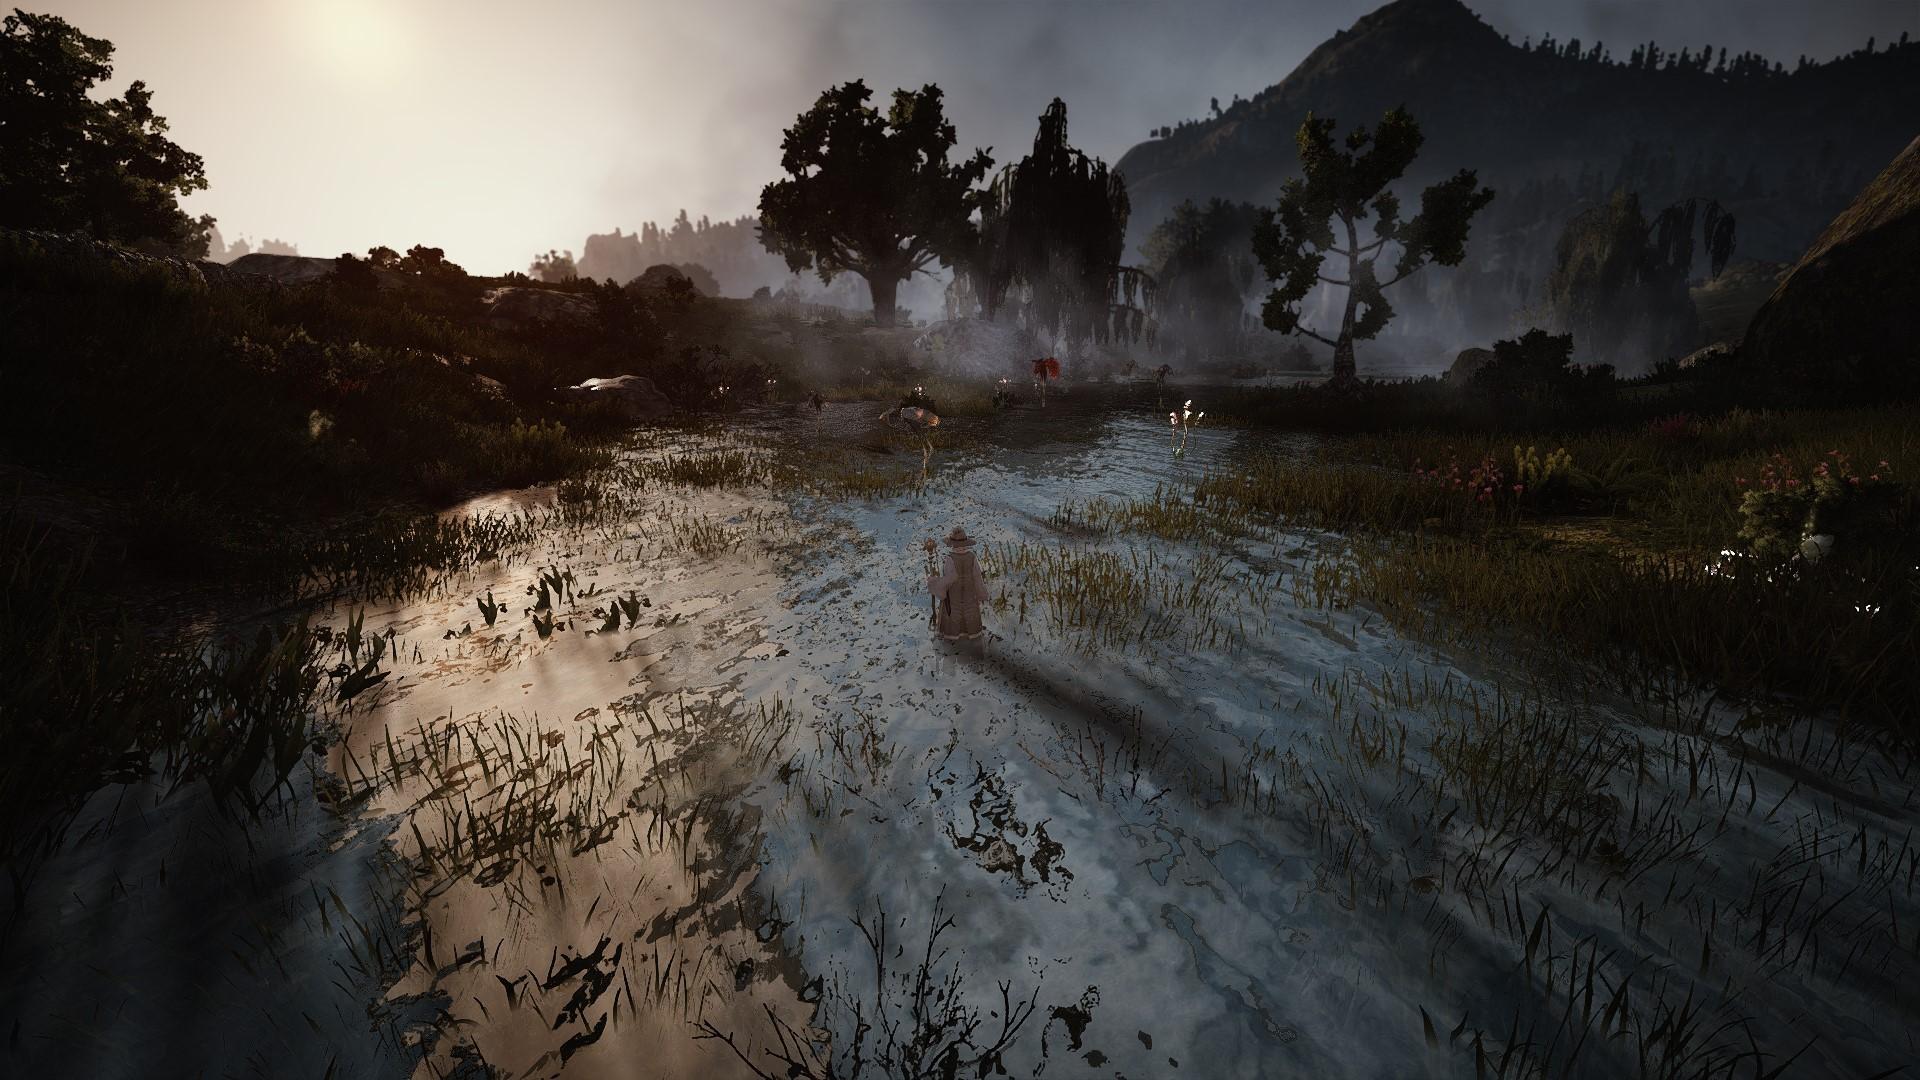 ScreenshotsSuch a beautifull world, I can breath the morning fog!